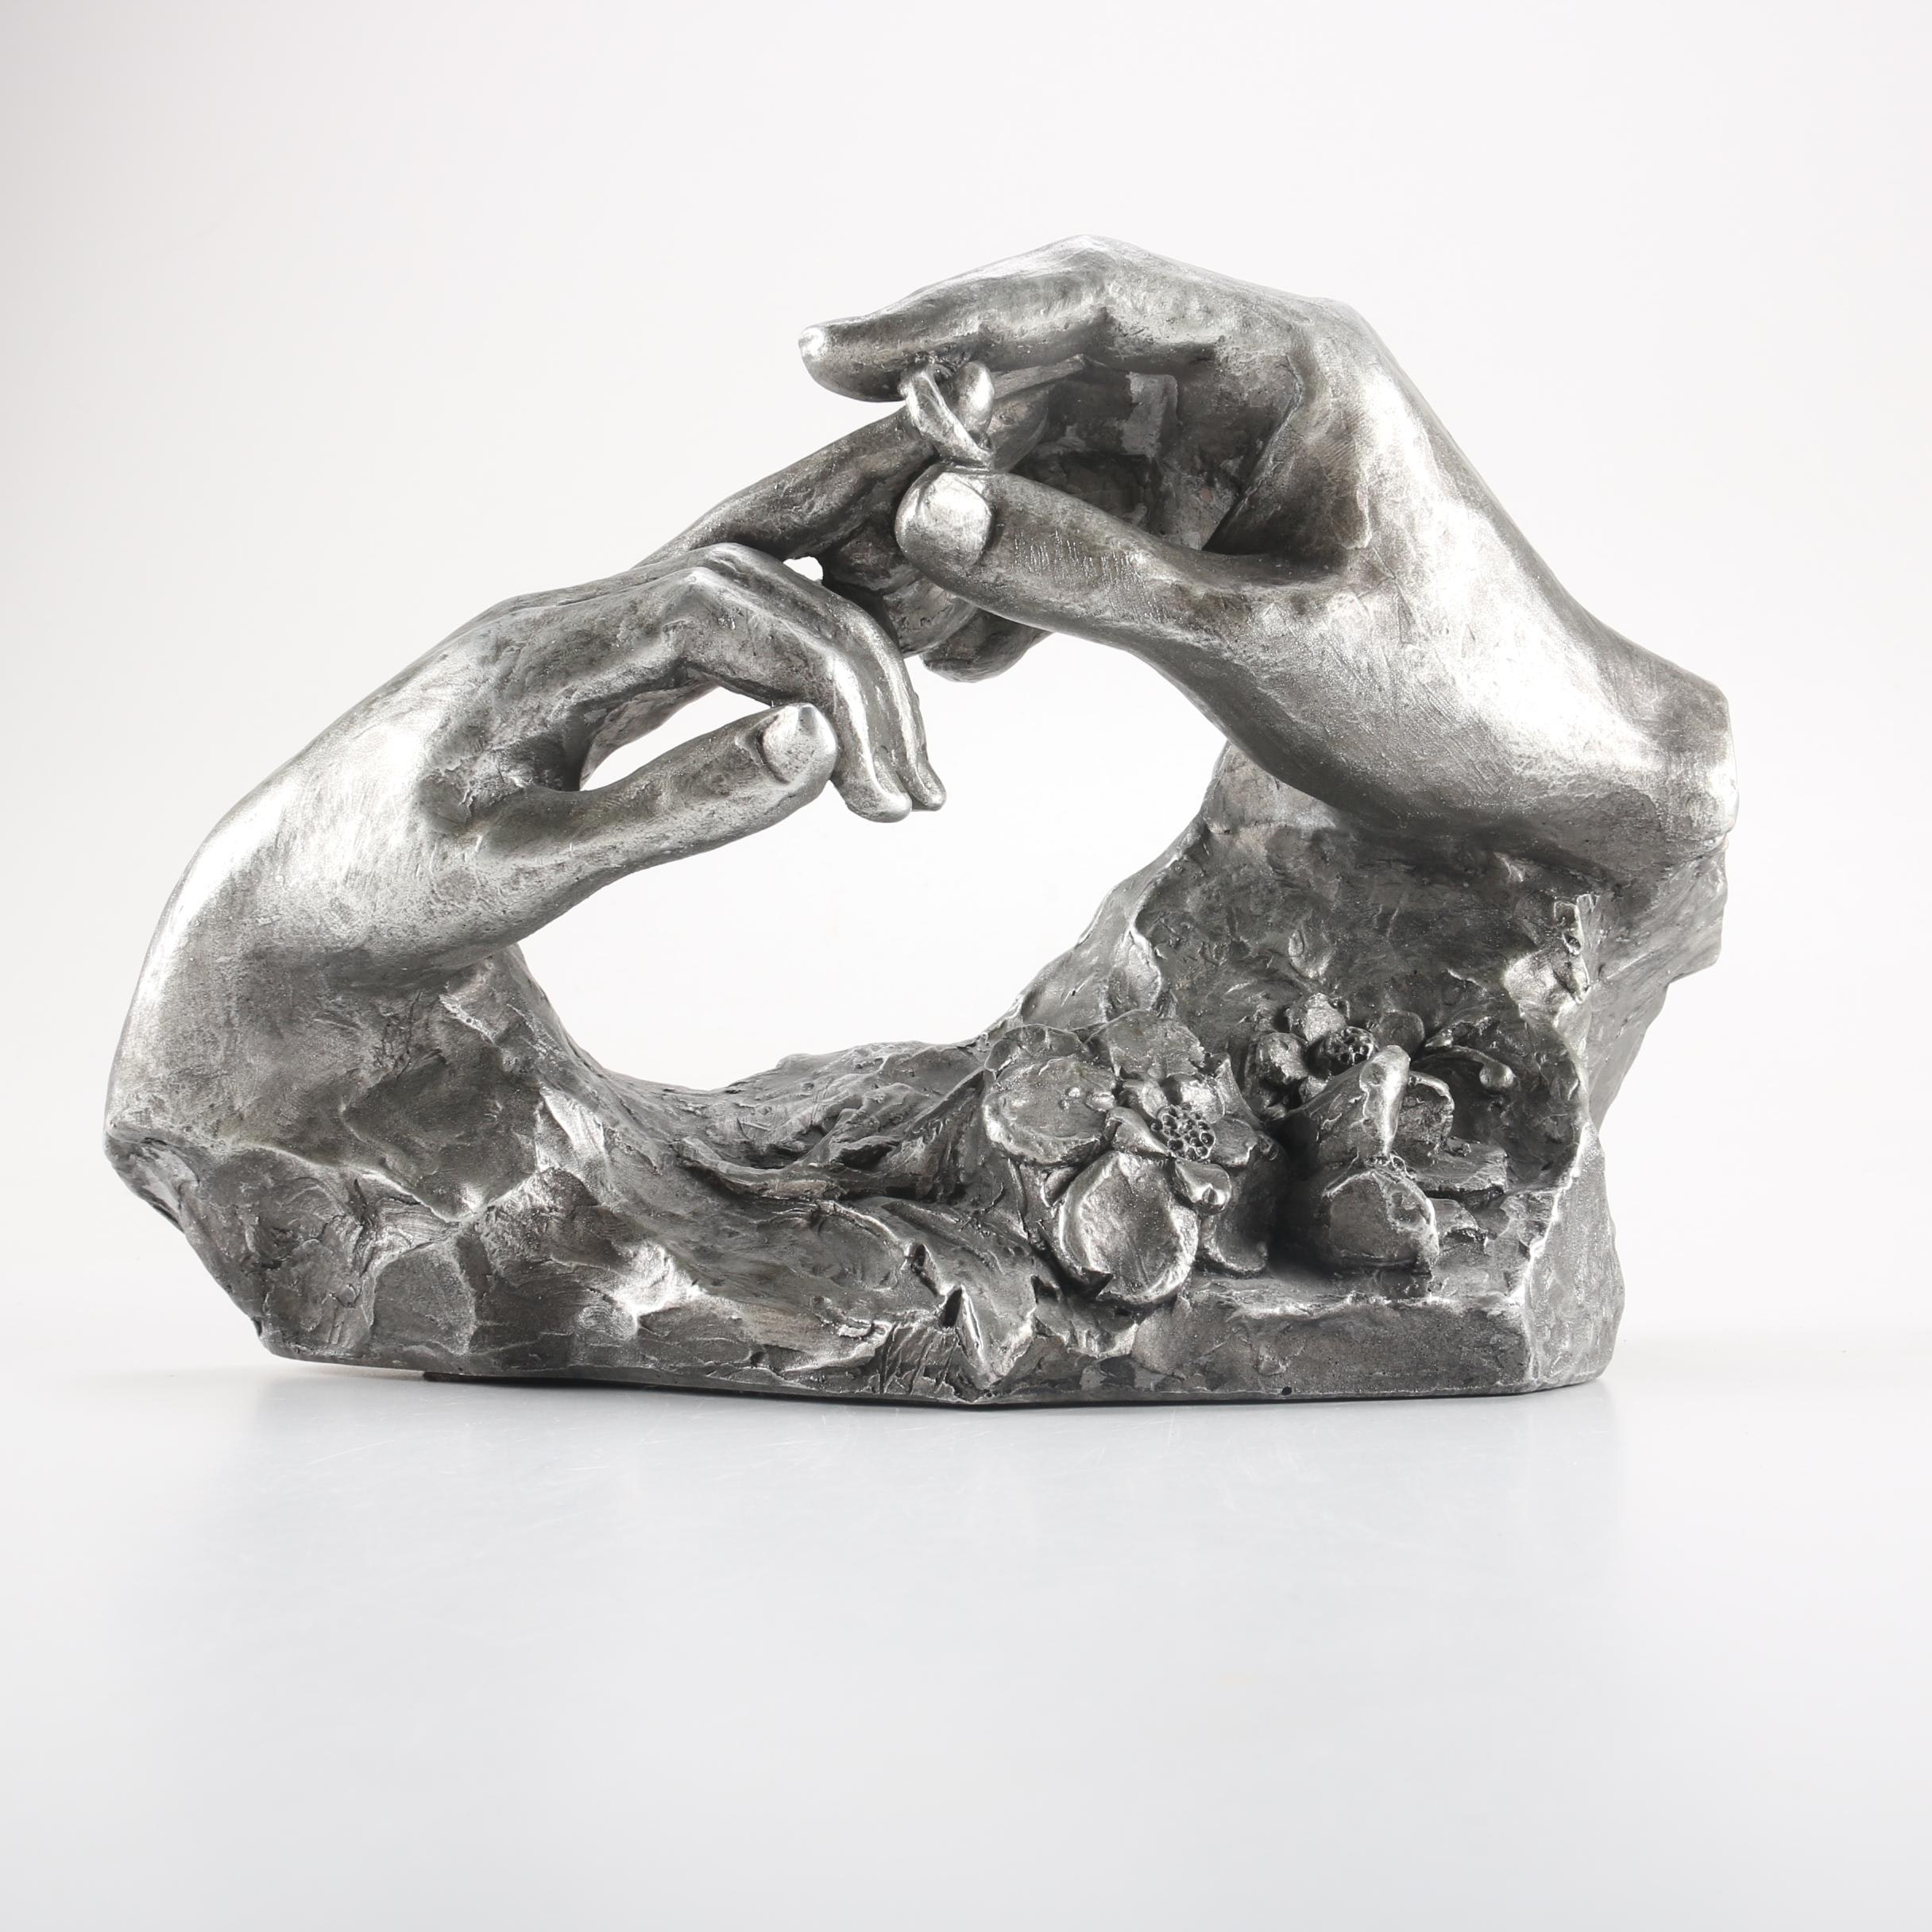 Austin Prod Inc. 1980 Wedding Ring Sculpture